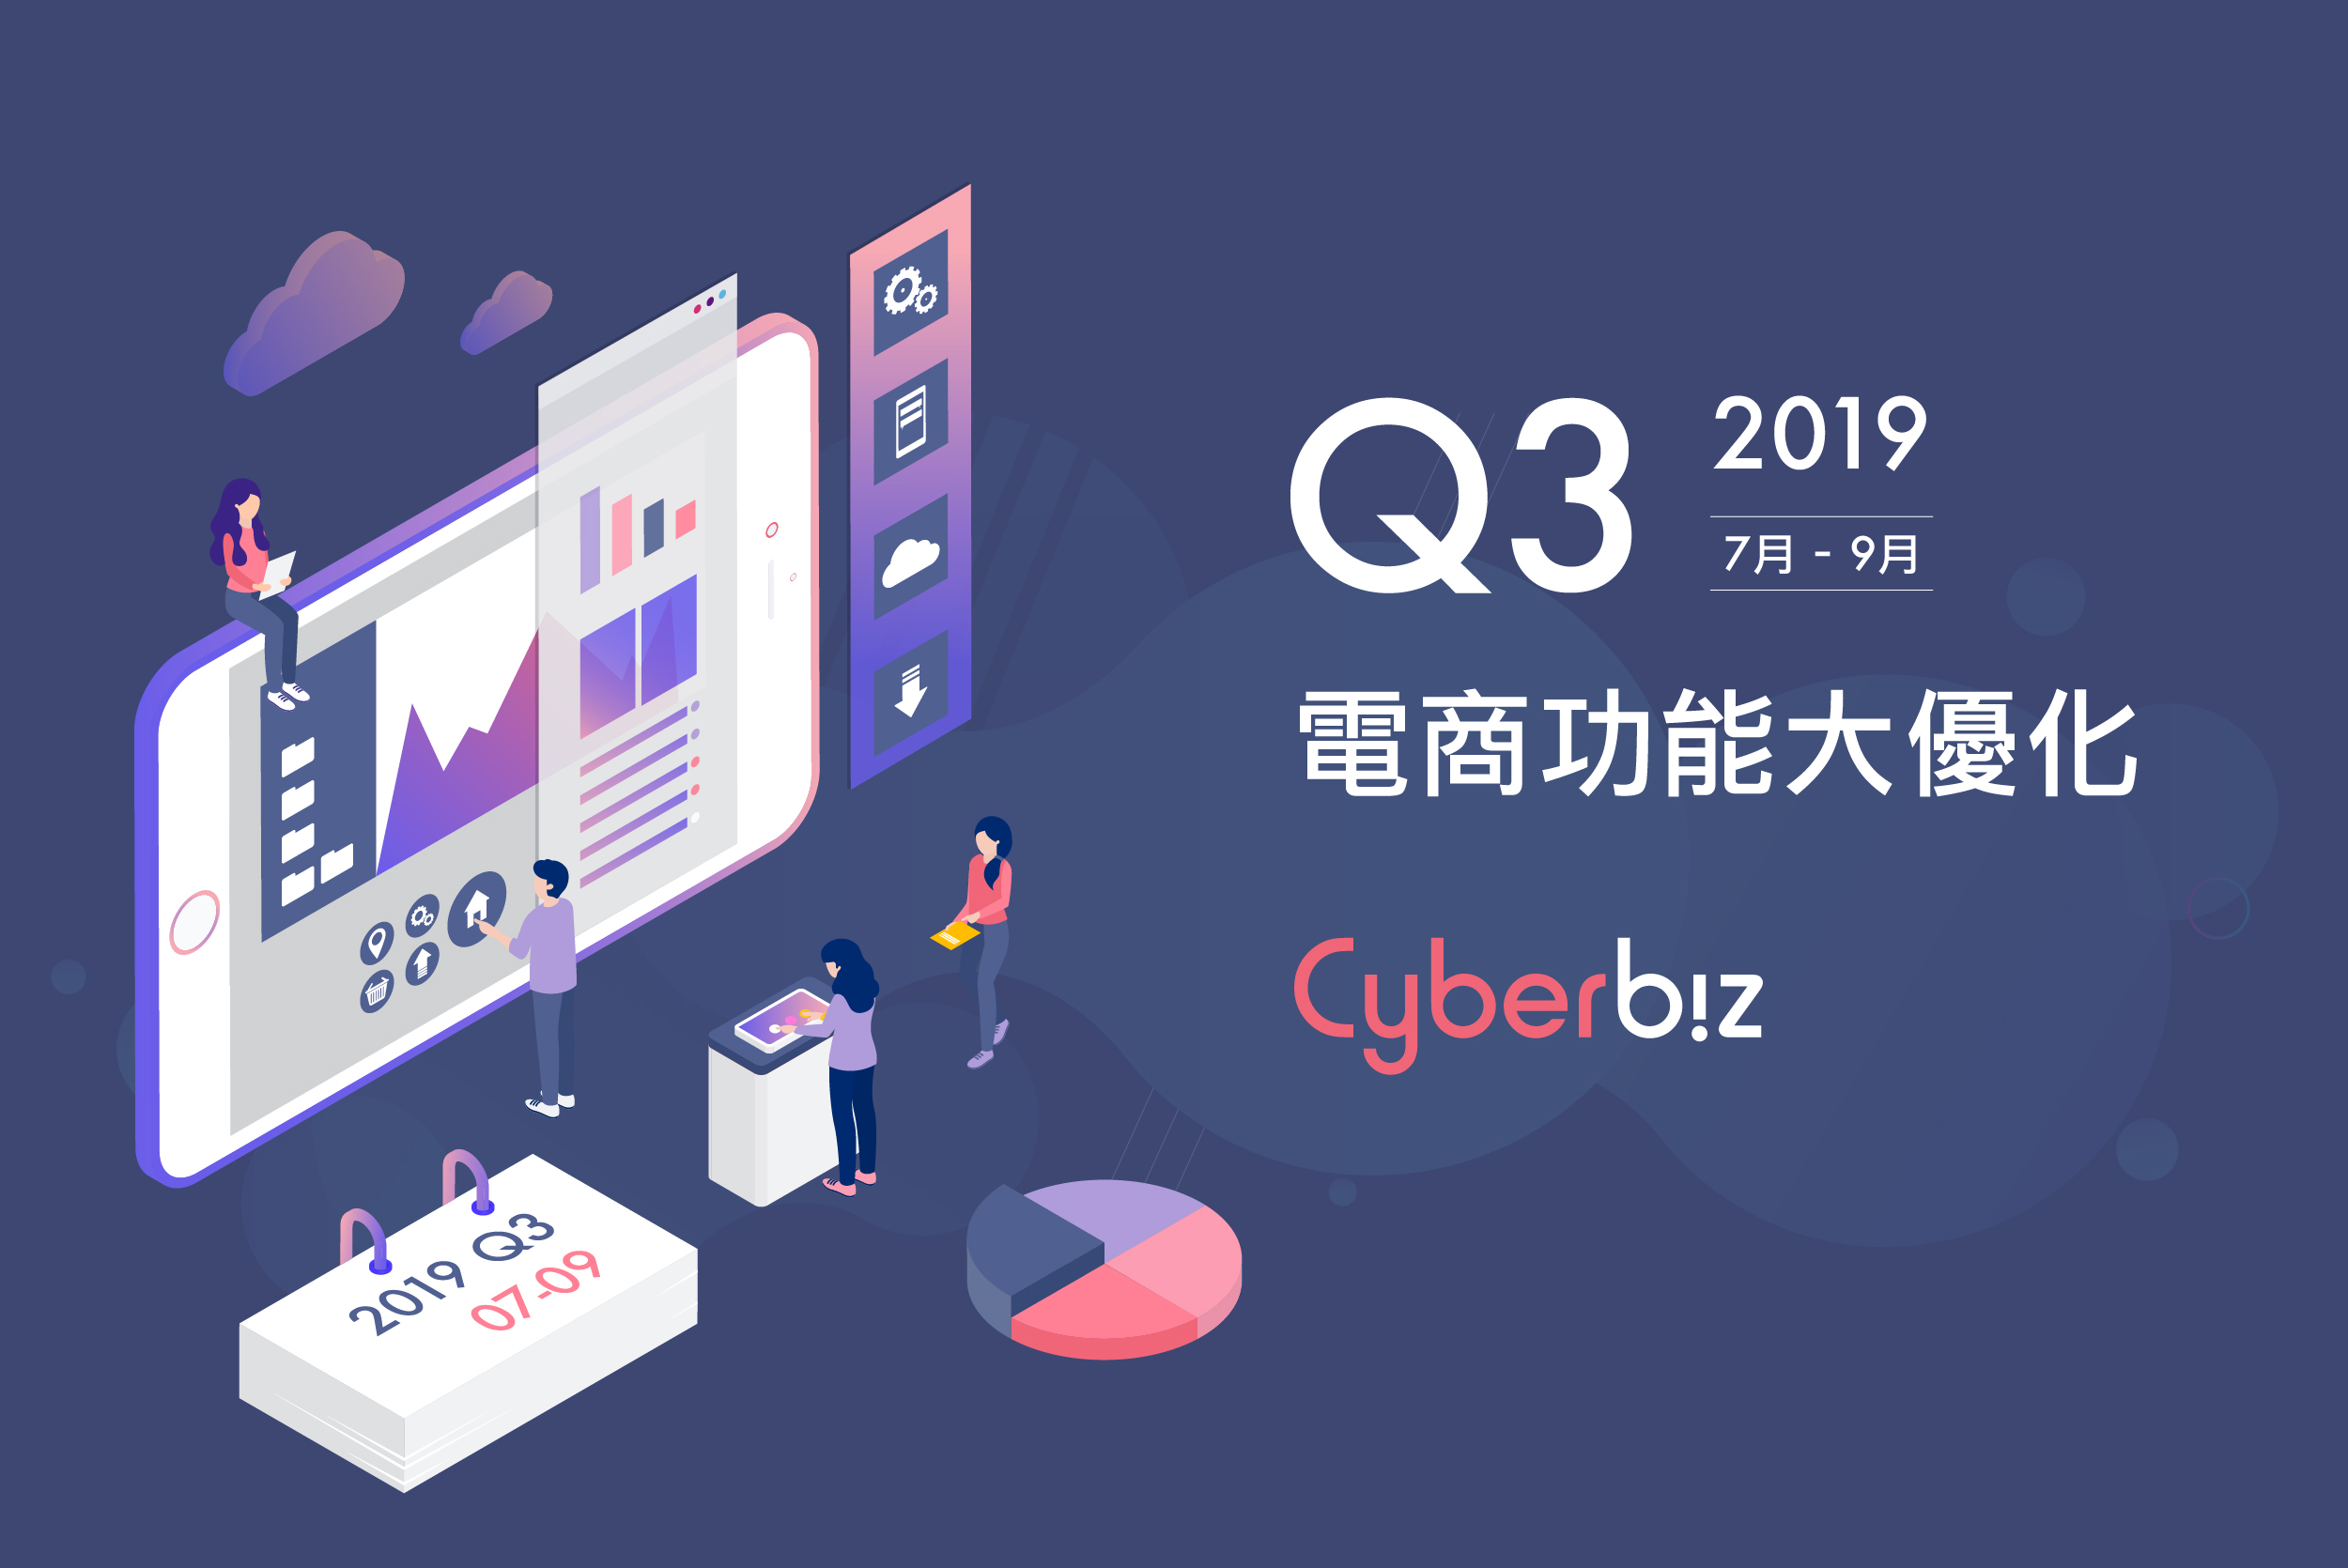 Cyberbiz 2019Q3 功能優化大進擊,不可不知的電商趨勢,老闆們跟上了嗎?